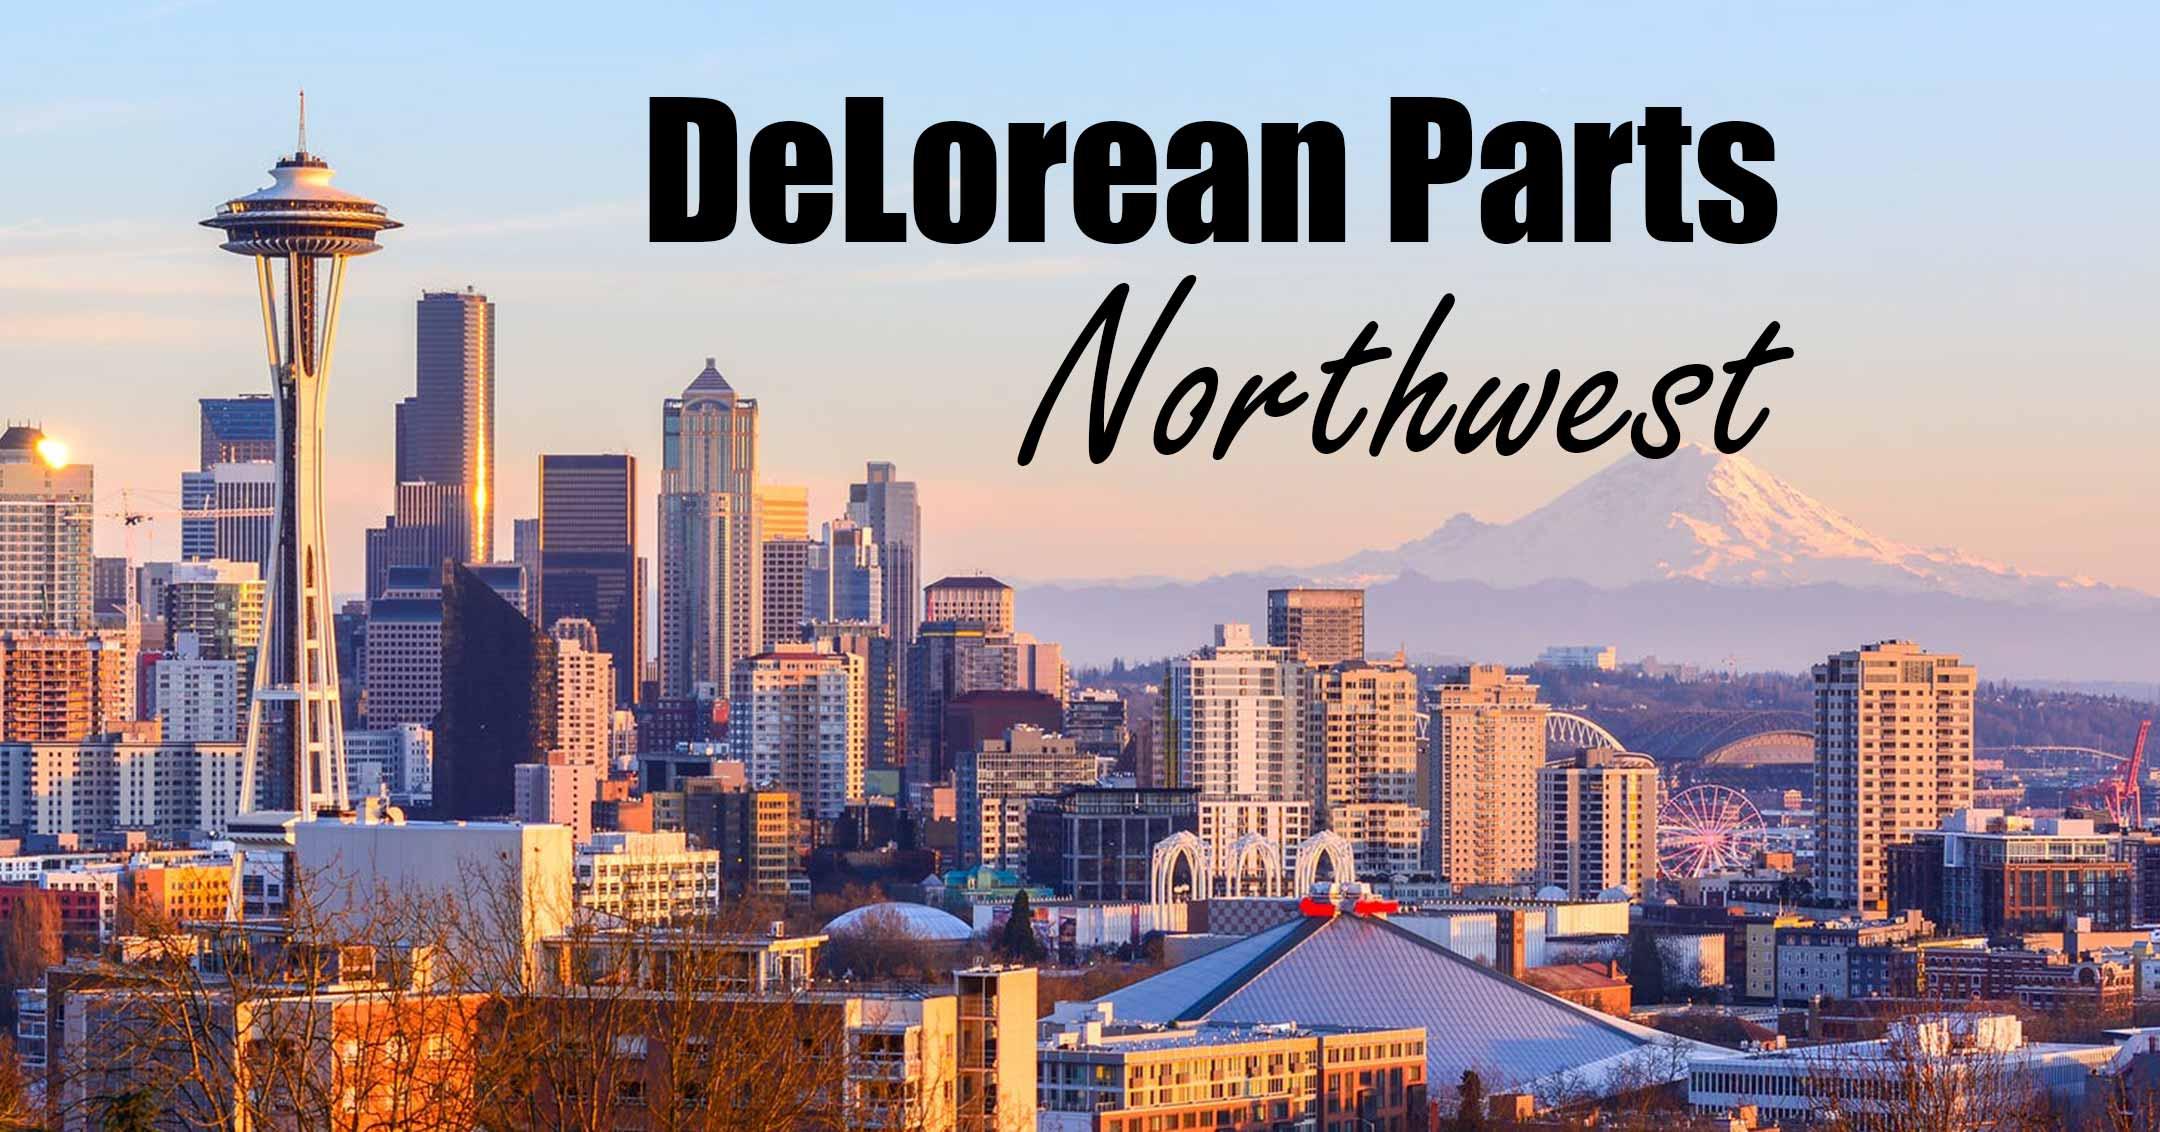 DeLorean Parts Northwest